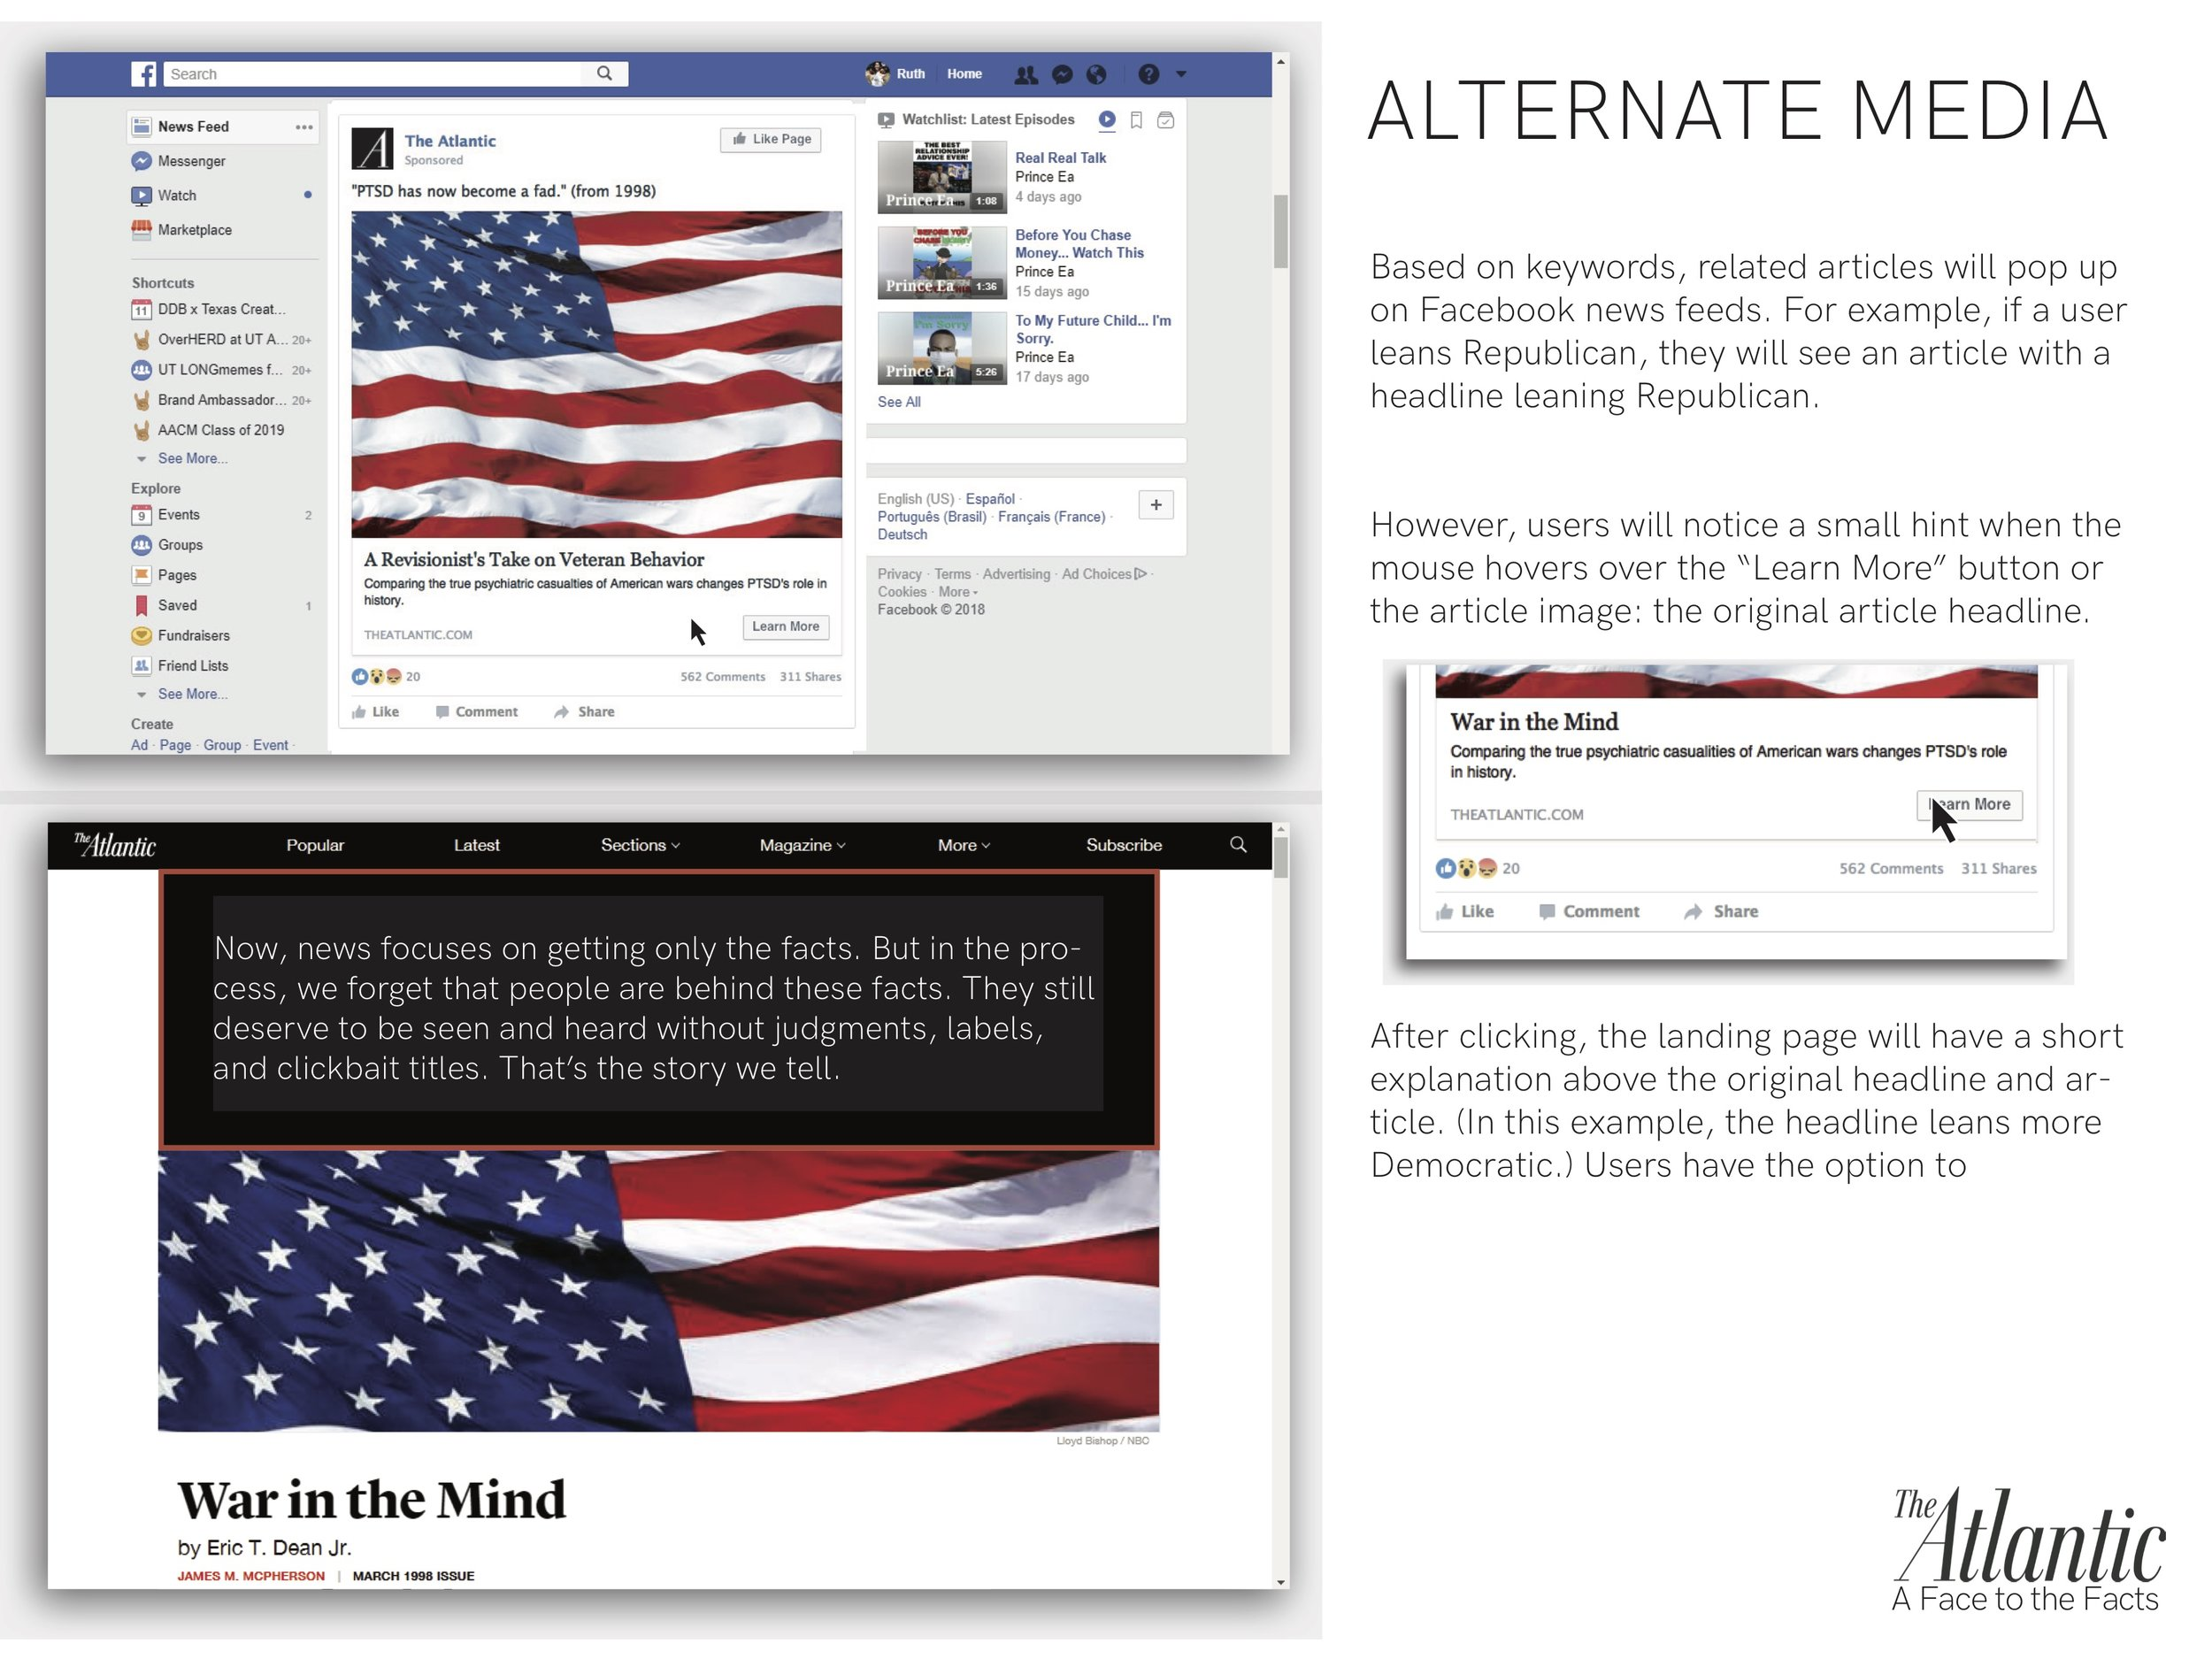 TheAtlantic_AltMedia2.jpg